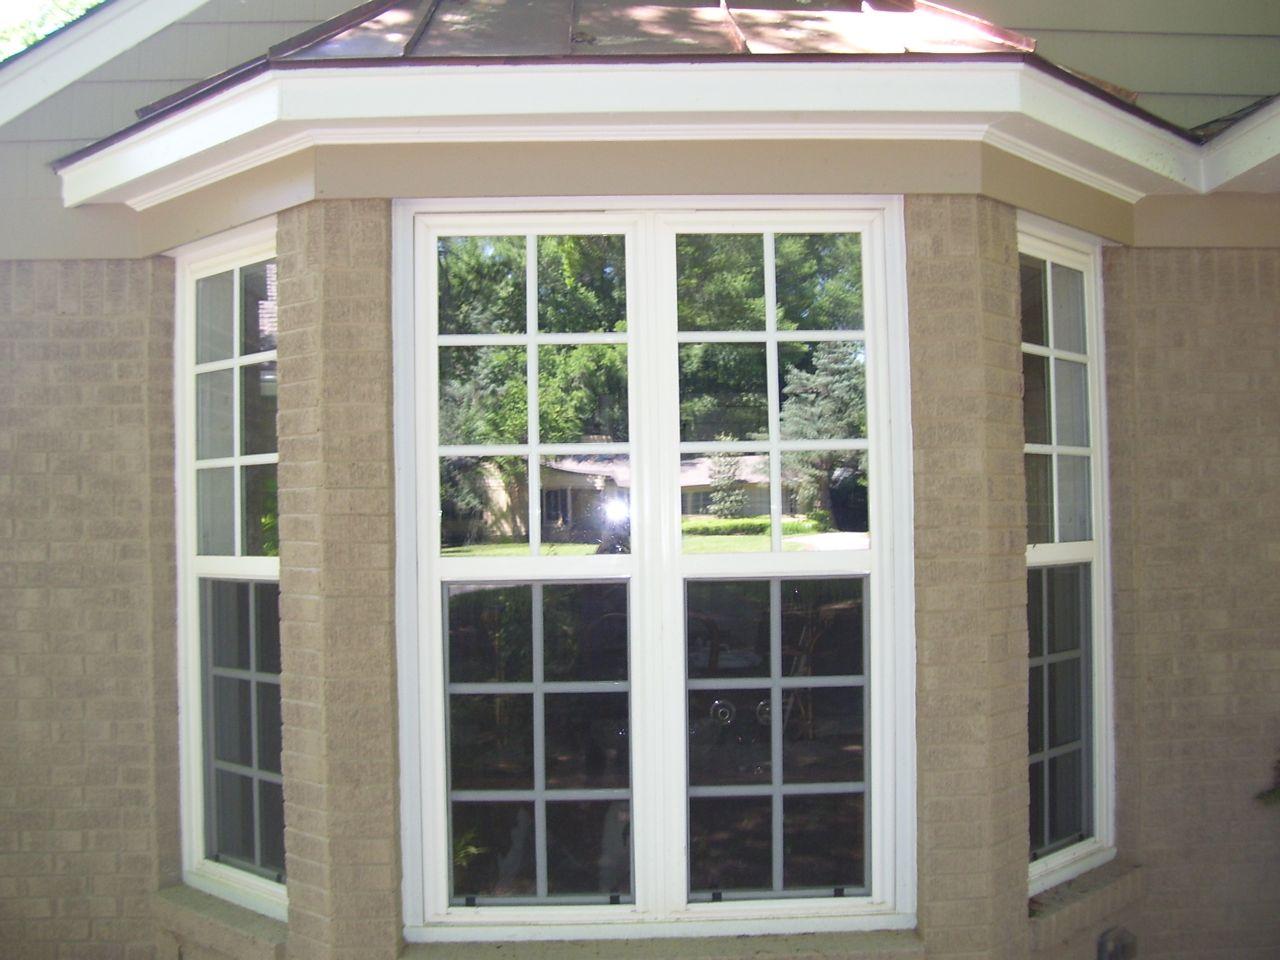 french bay windows caurora com just all about windows and doors 786753 legtobben az ablakszigetelessel kapcsolatban leginkabb a teli french bay windows 7367 pic 12809607367